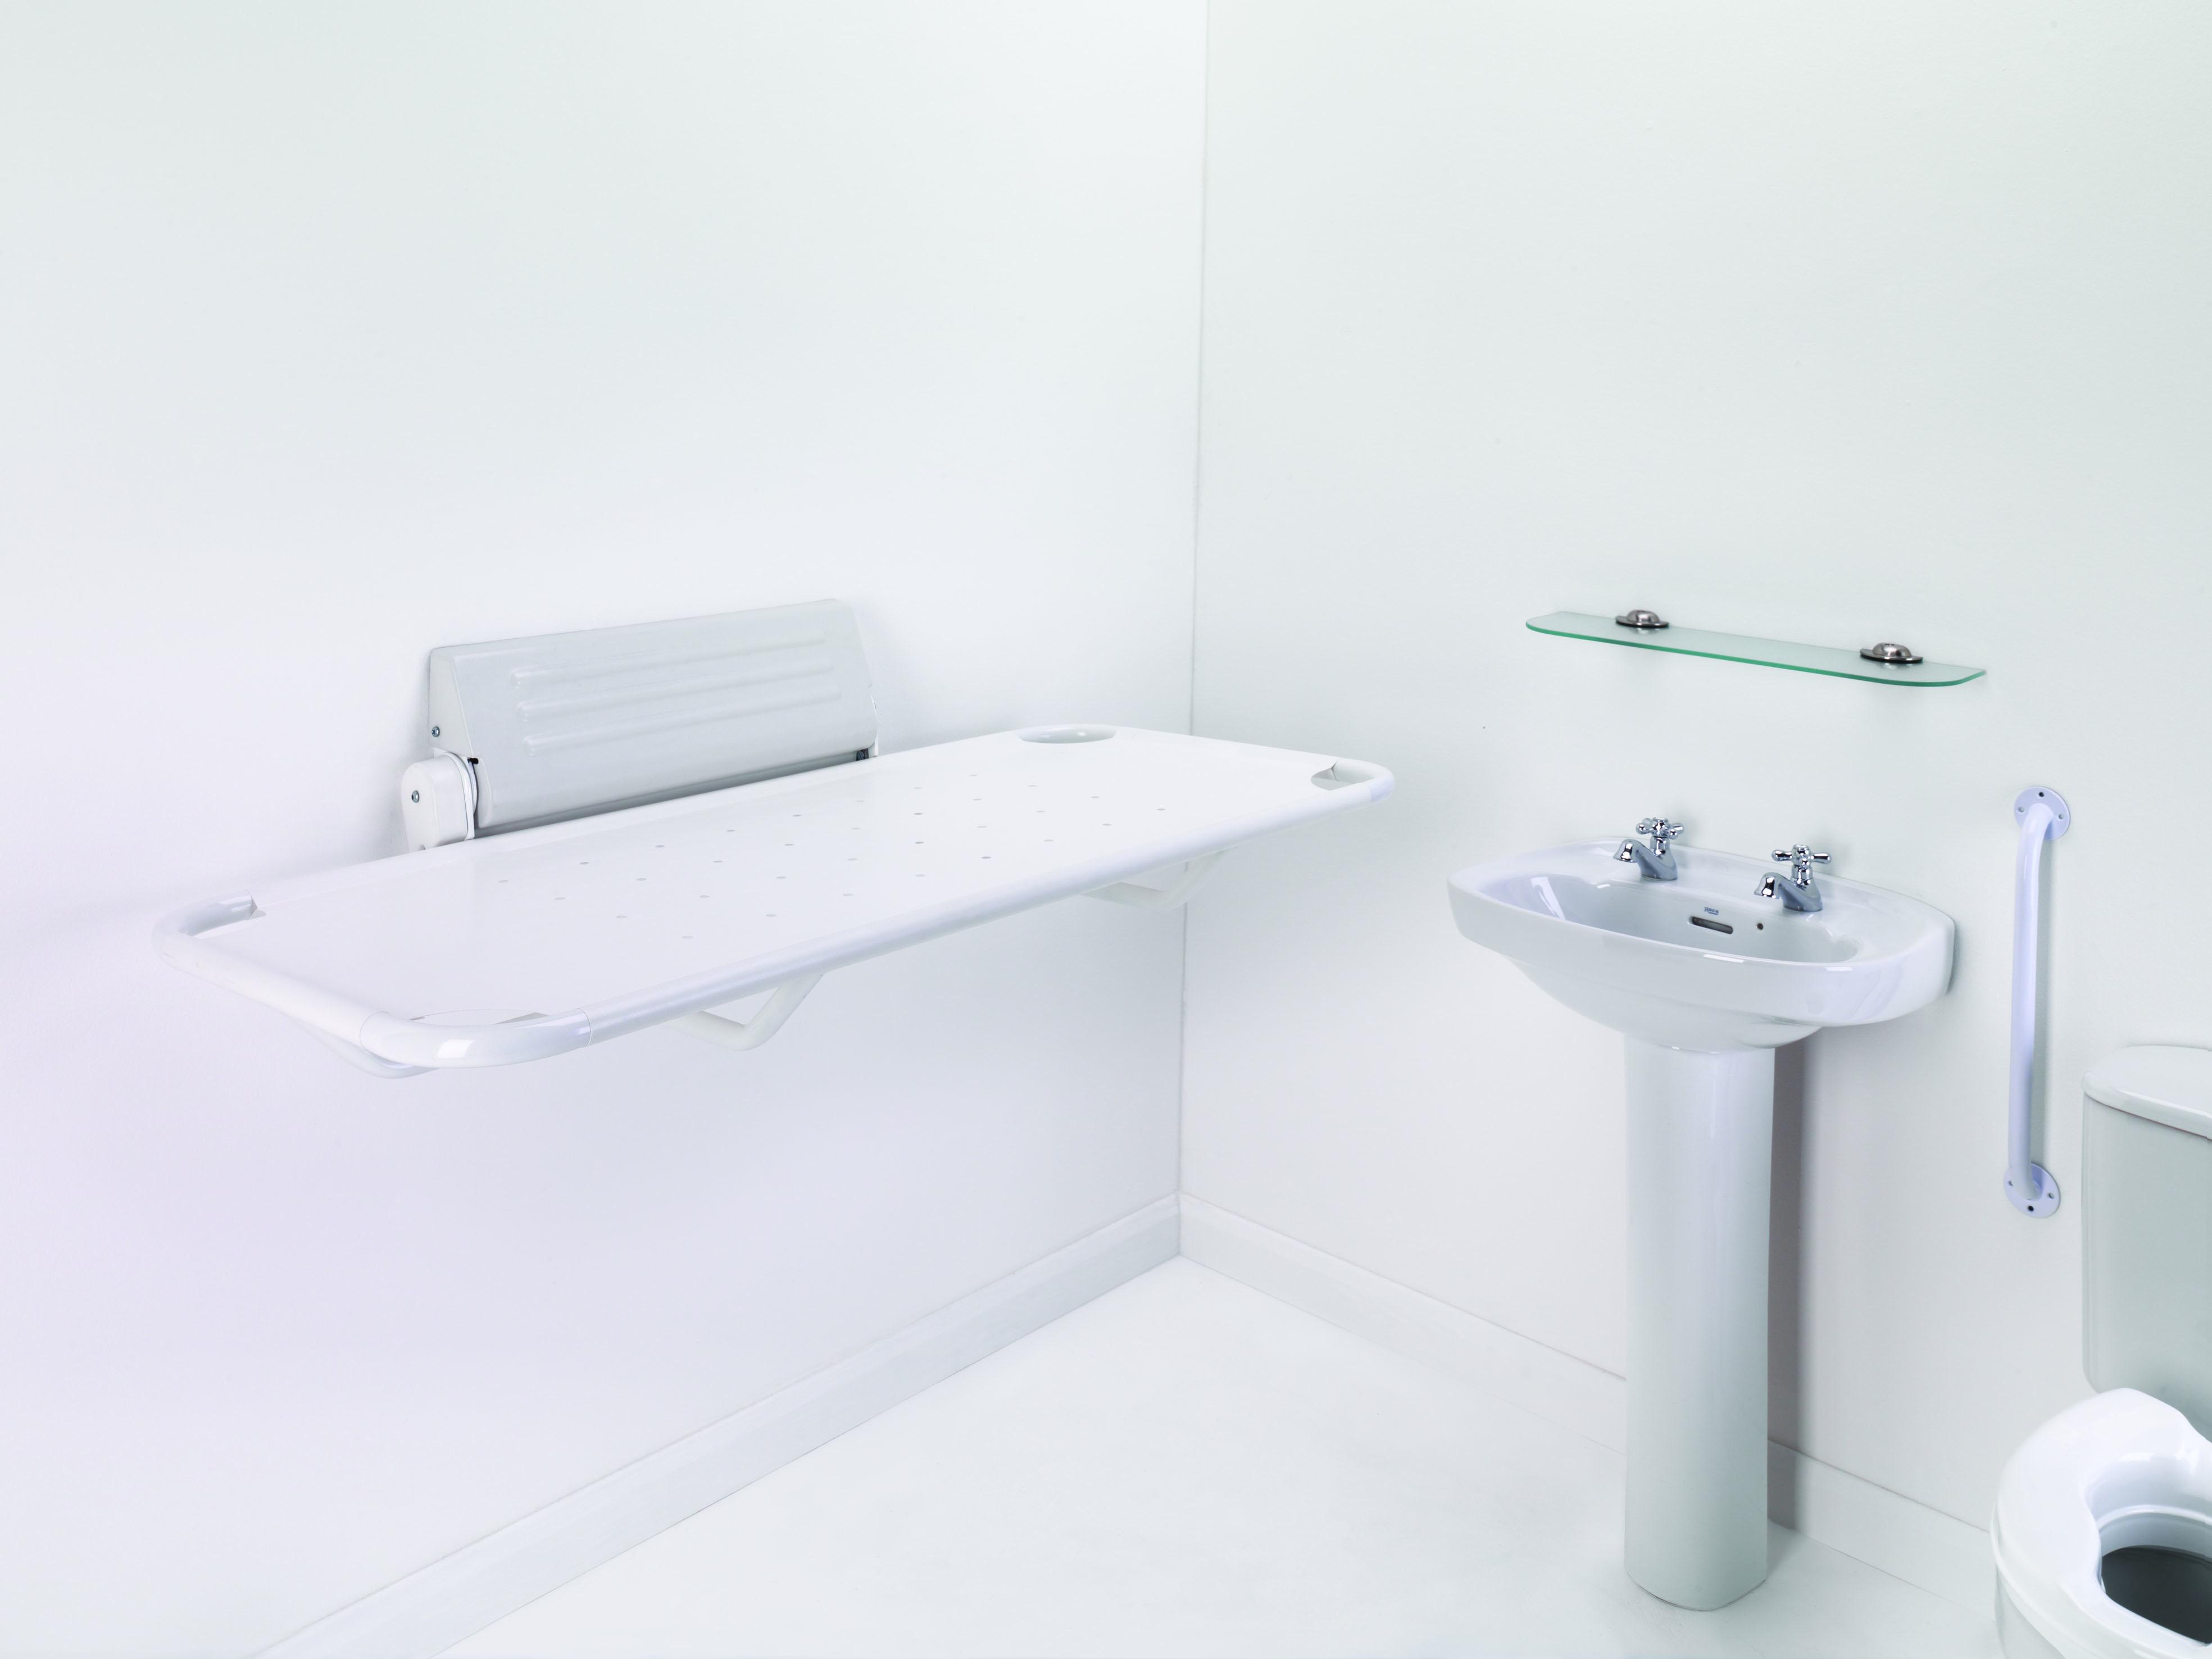 tr product trolley min baths patient healthcare chairlift trolleys hygiene categories shower mobile bath lift system ais